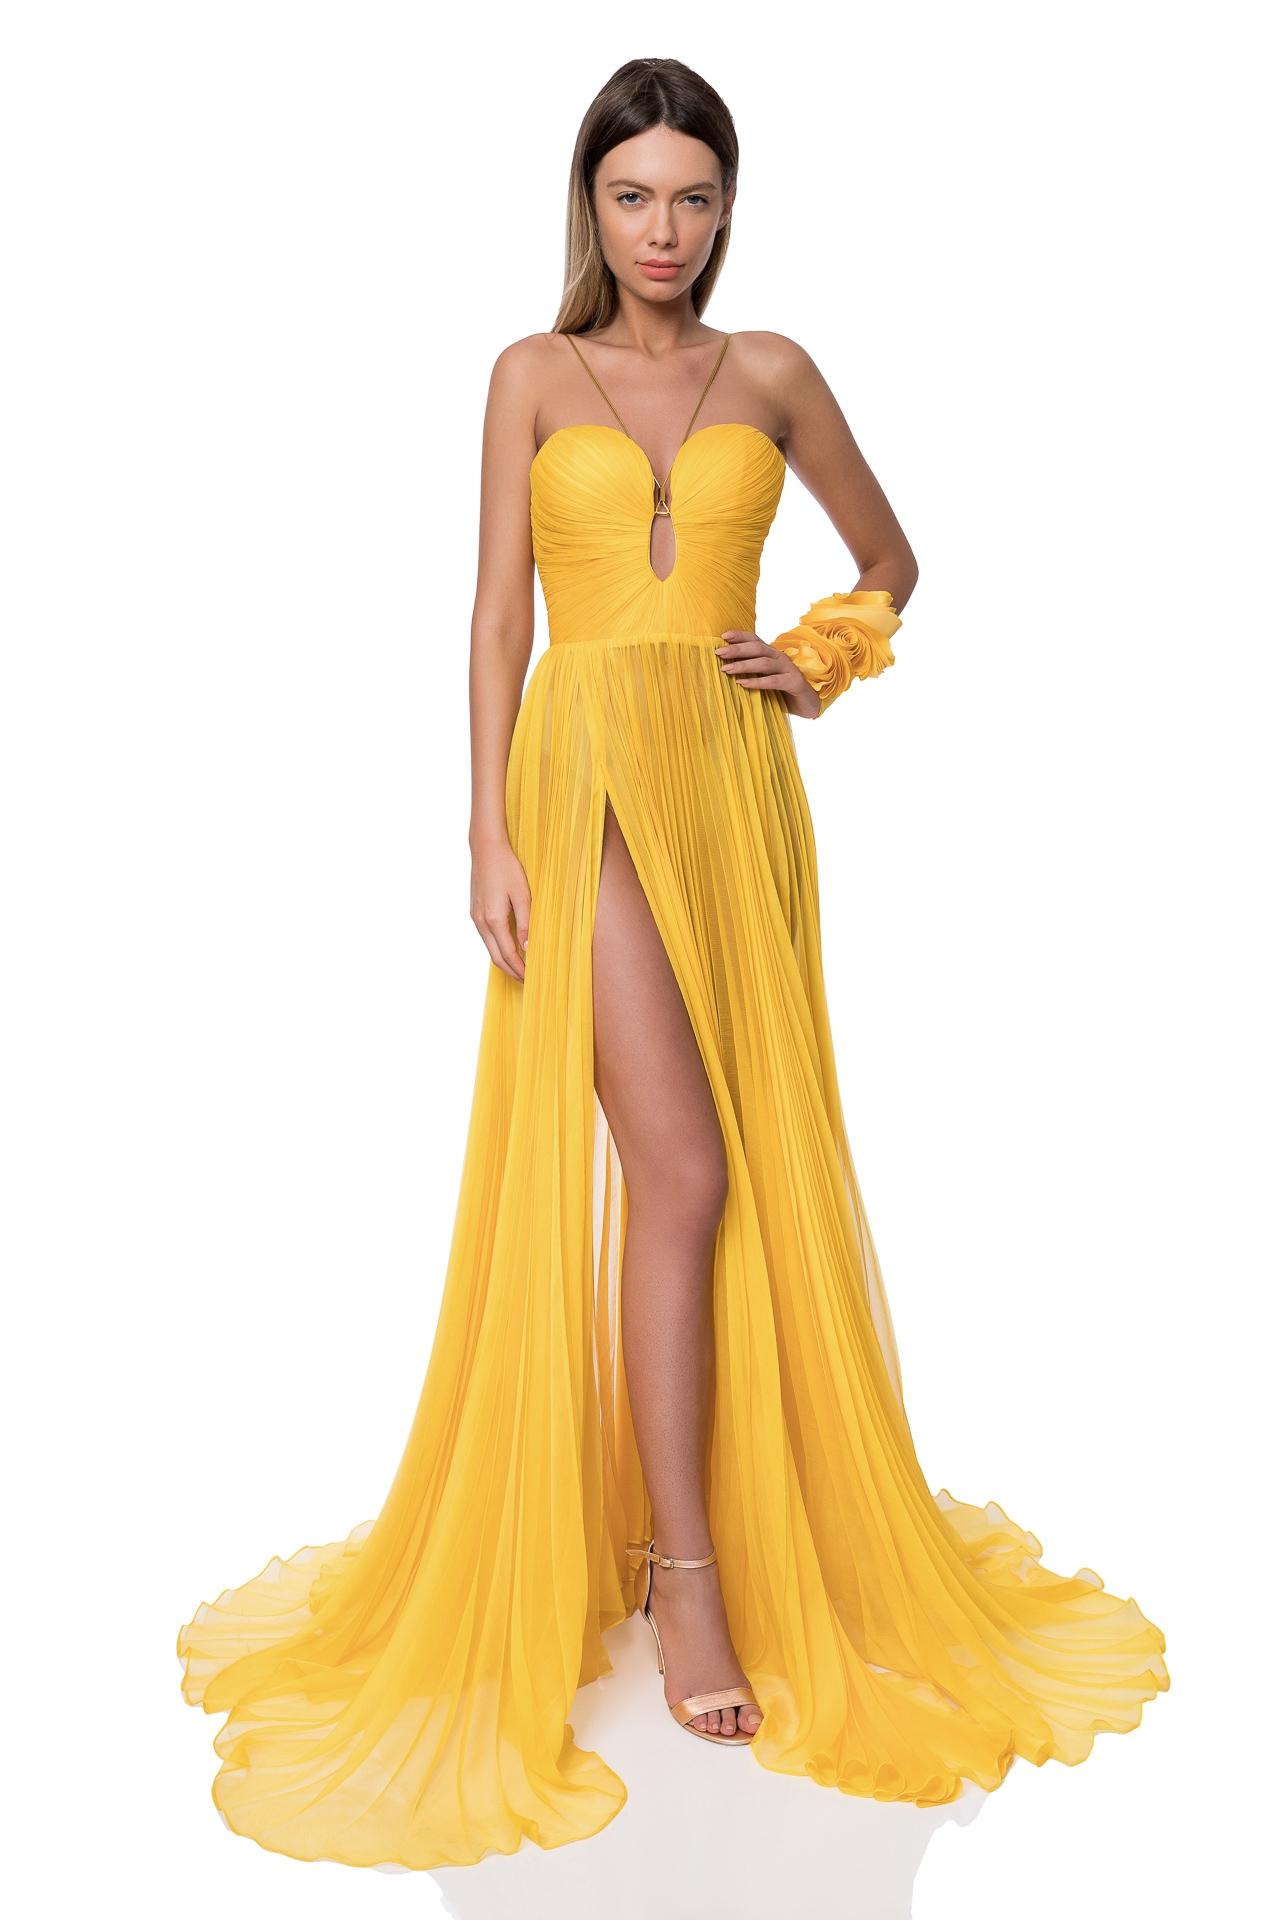 Sweetheart neckline evening dress